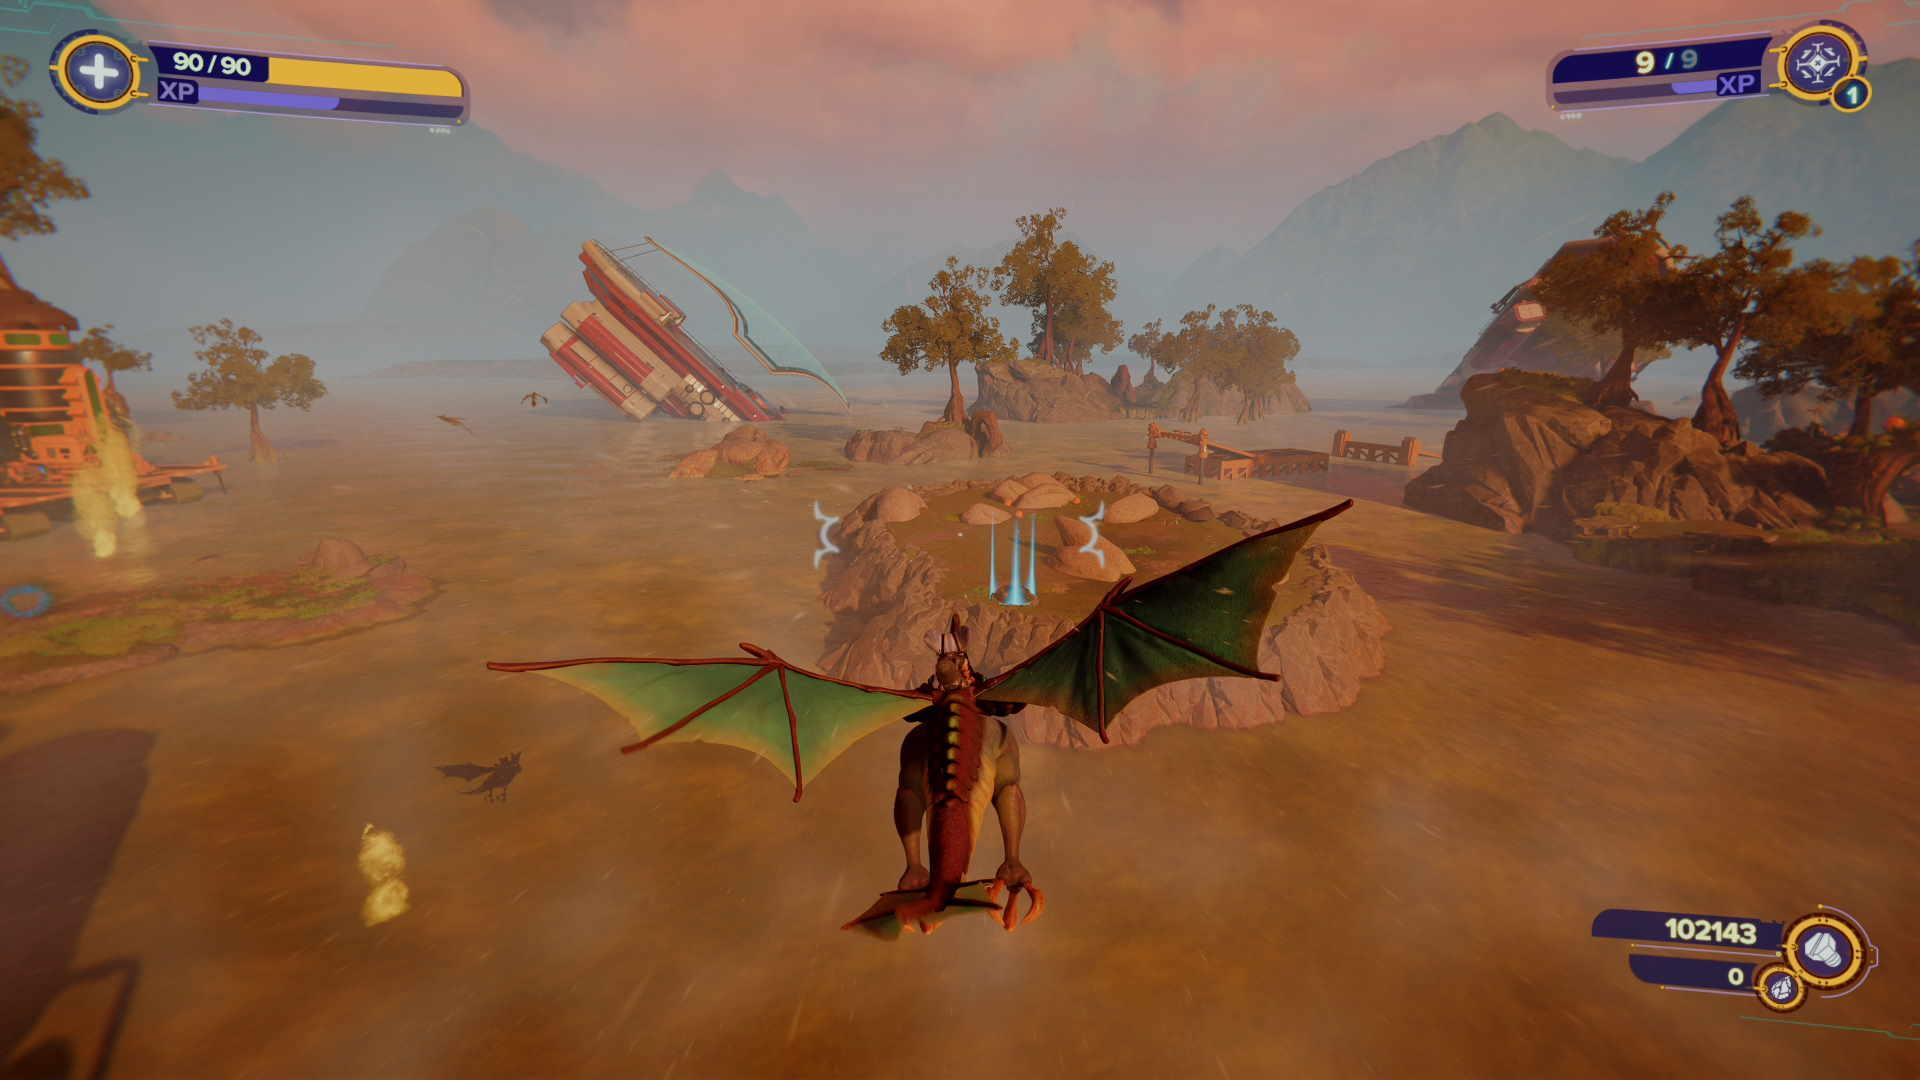 Flying on Trudi in Ratchet & Clank: Rift Apart